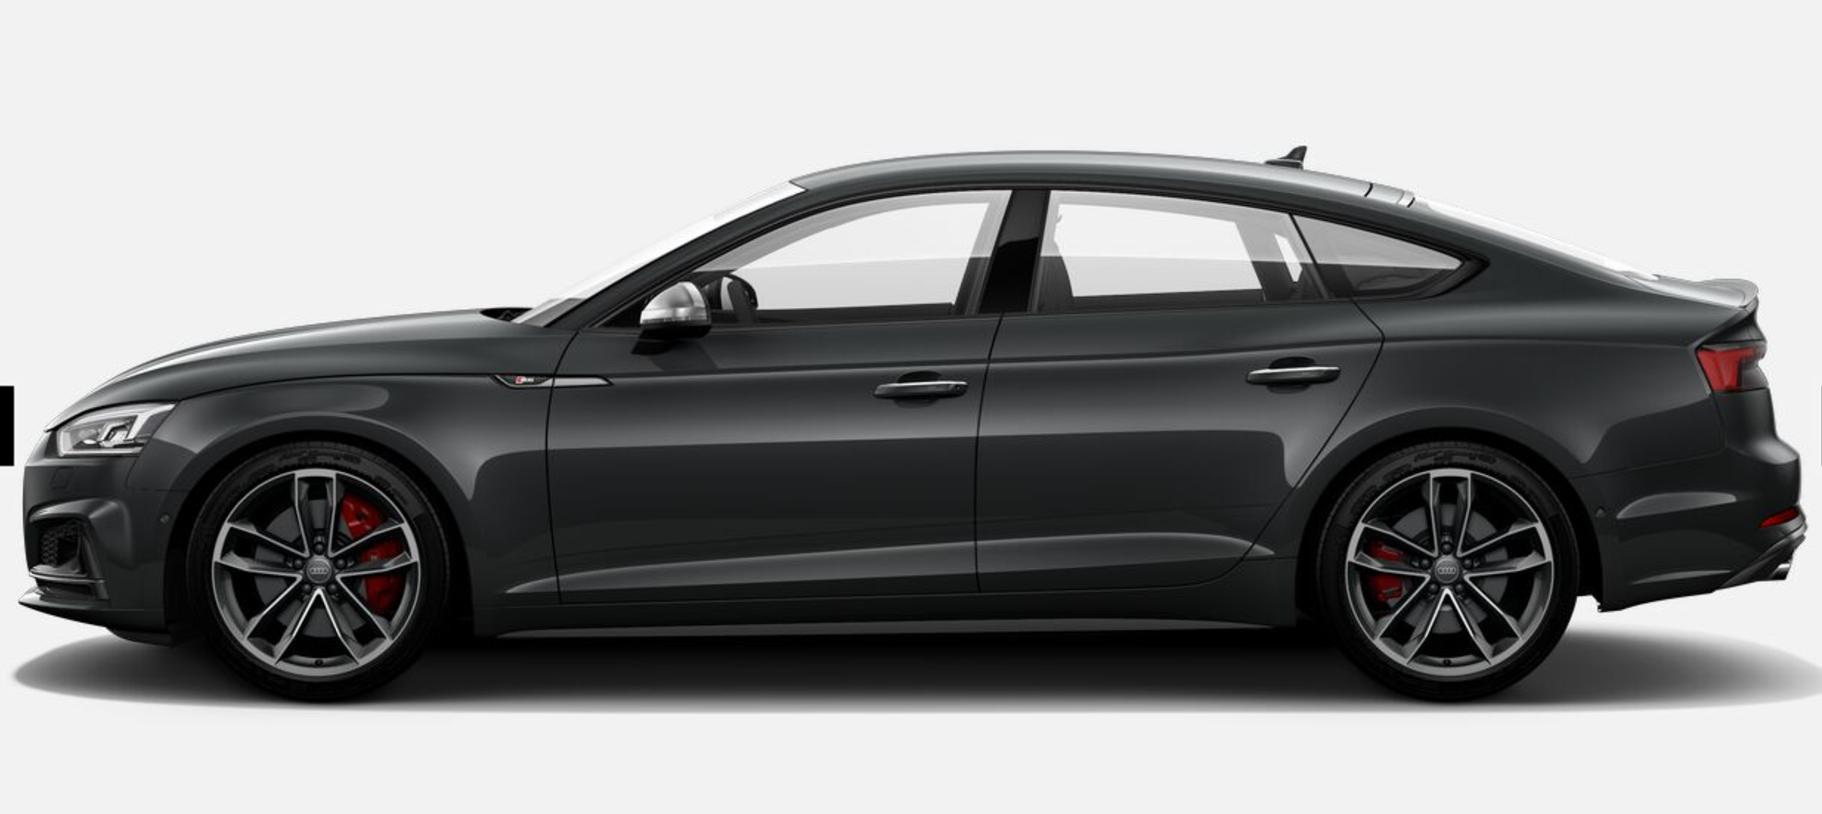 Audi A Sportback Prestige Package A S US Order Guide - Audi a5 sportback us